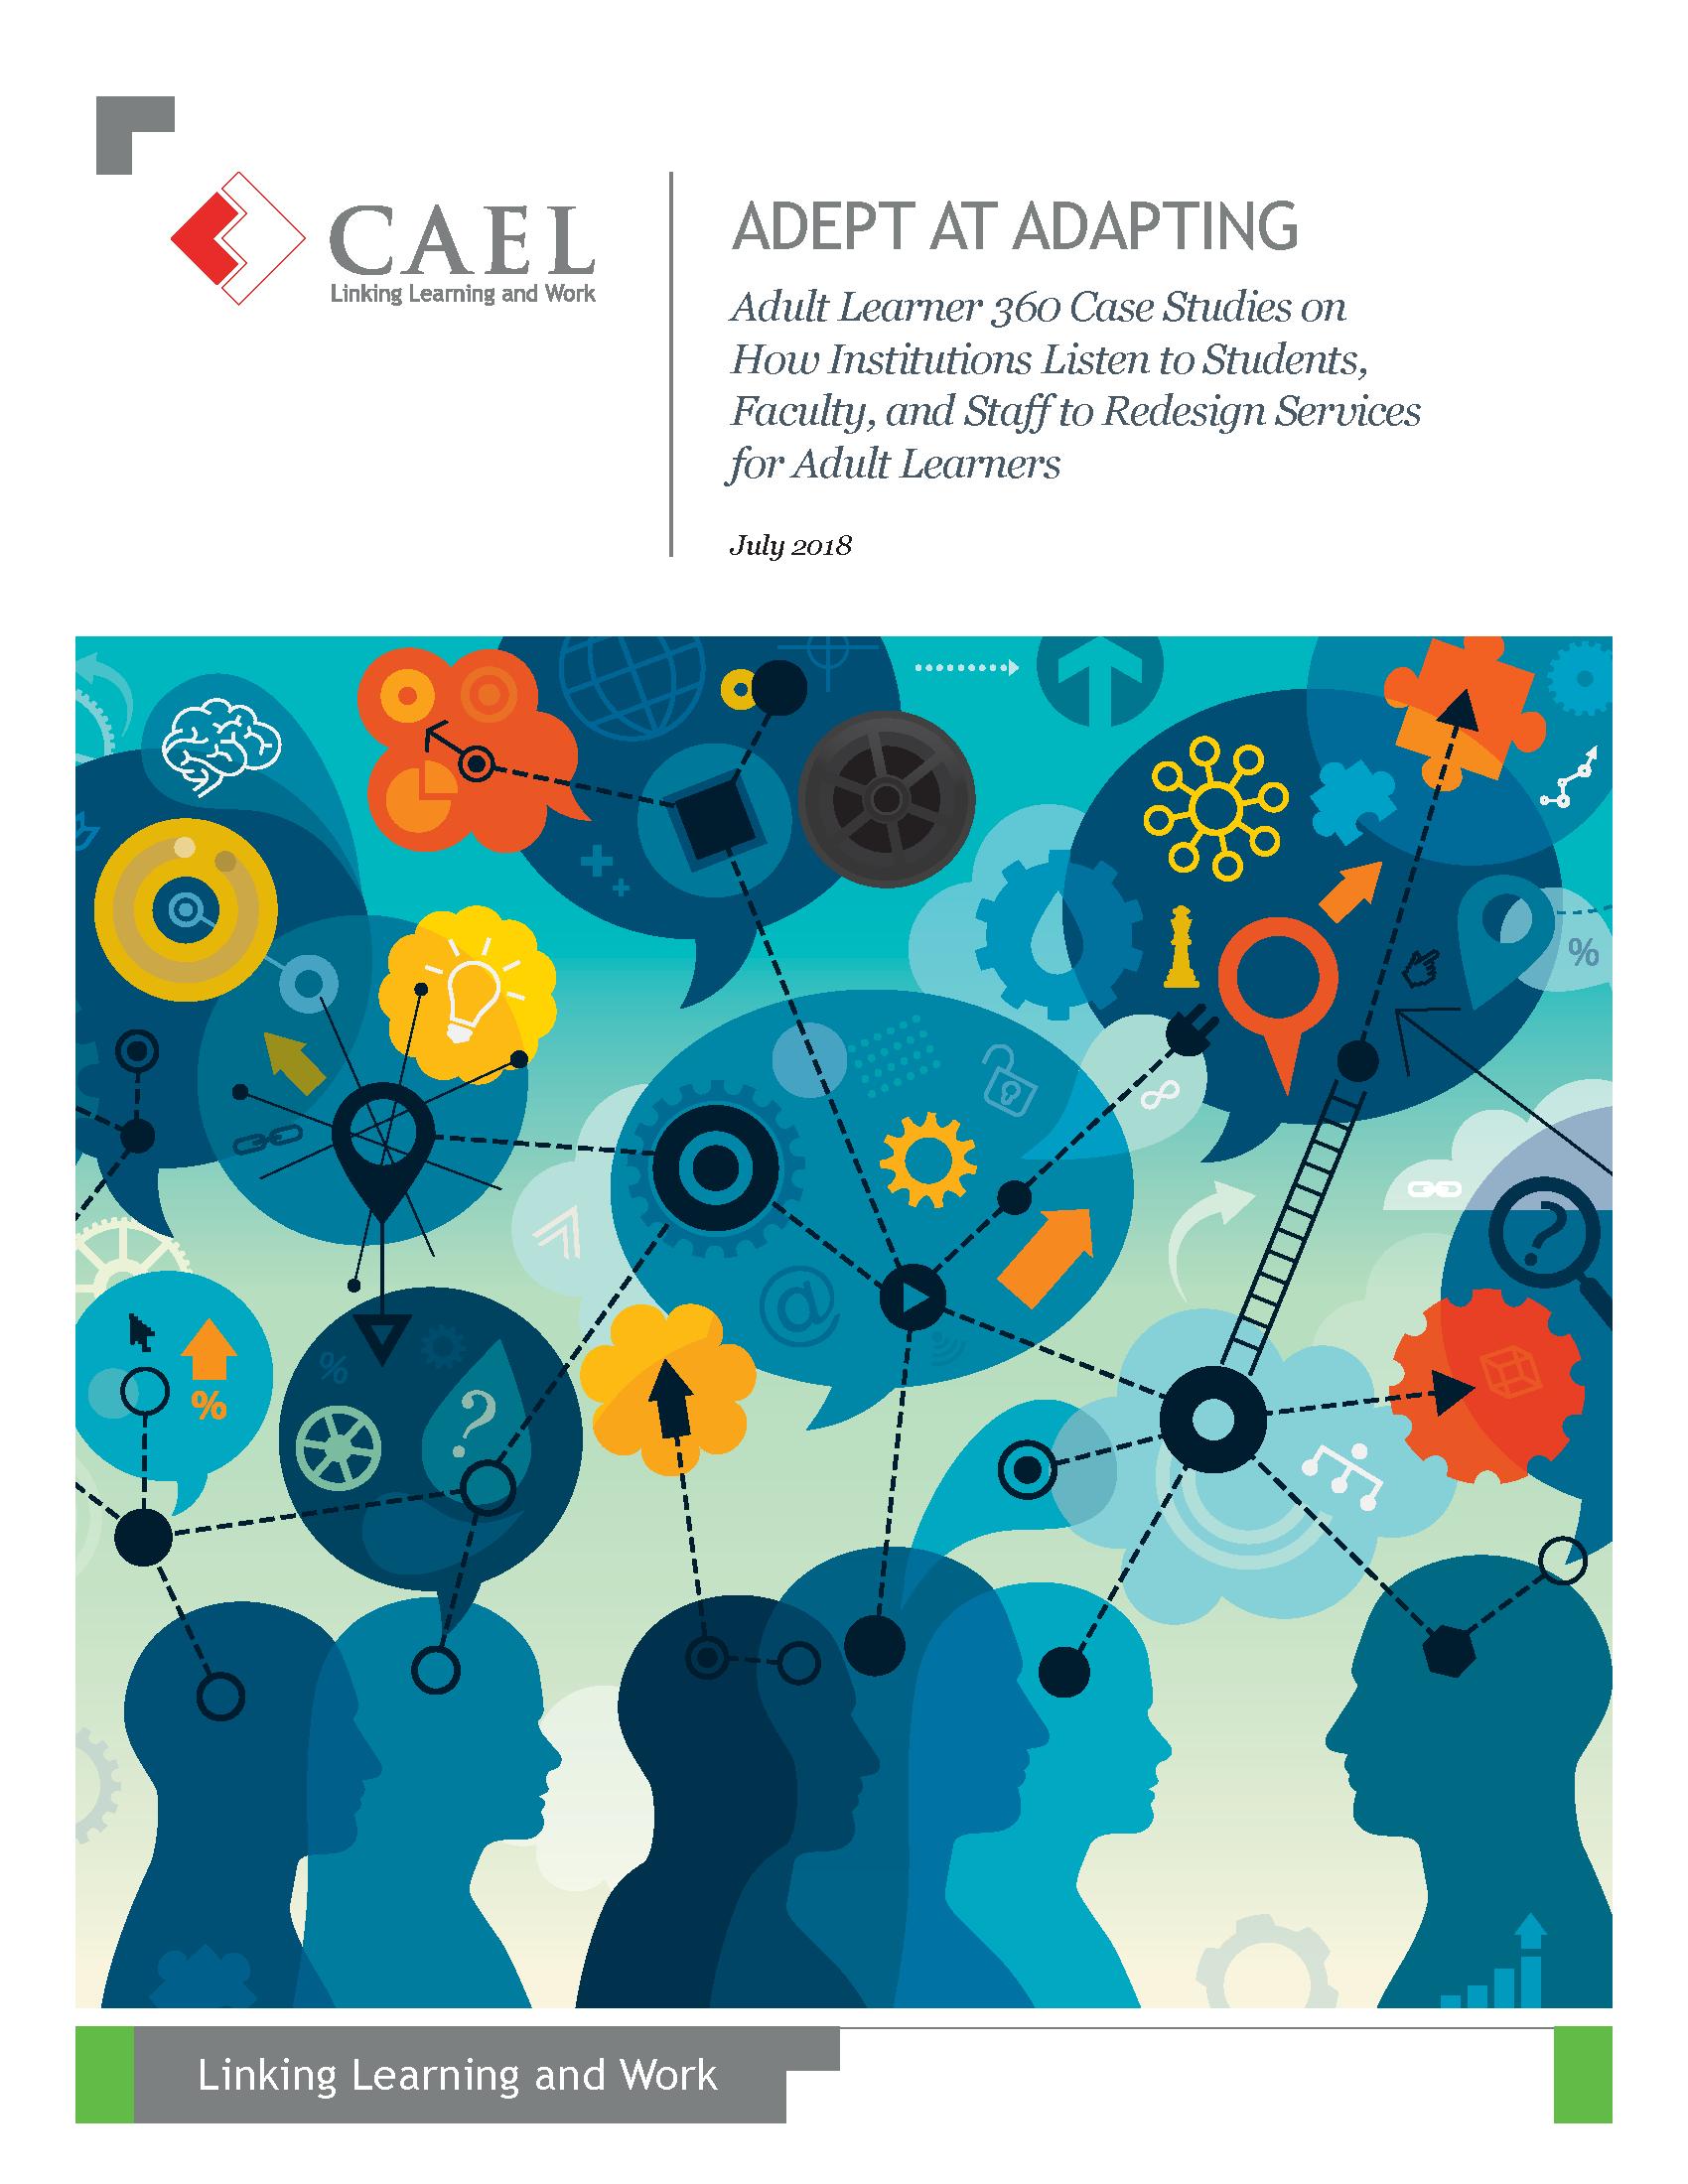 Adept at Adapting - Adult Learner 360 Case Studies